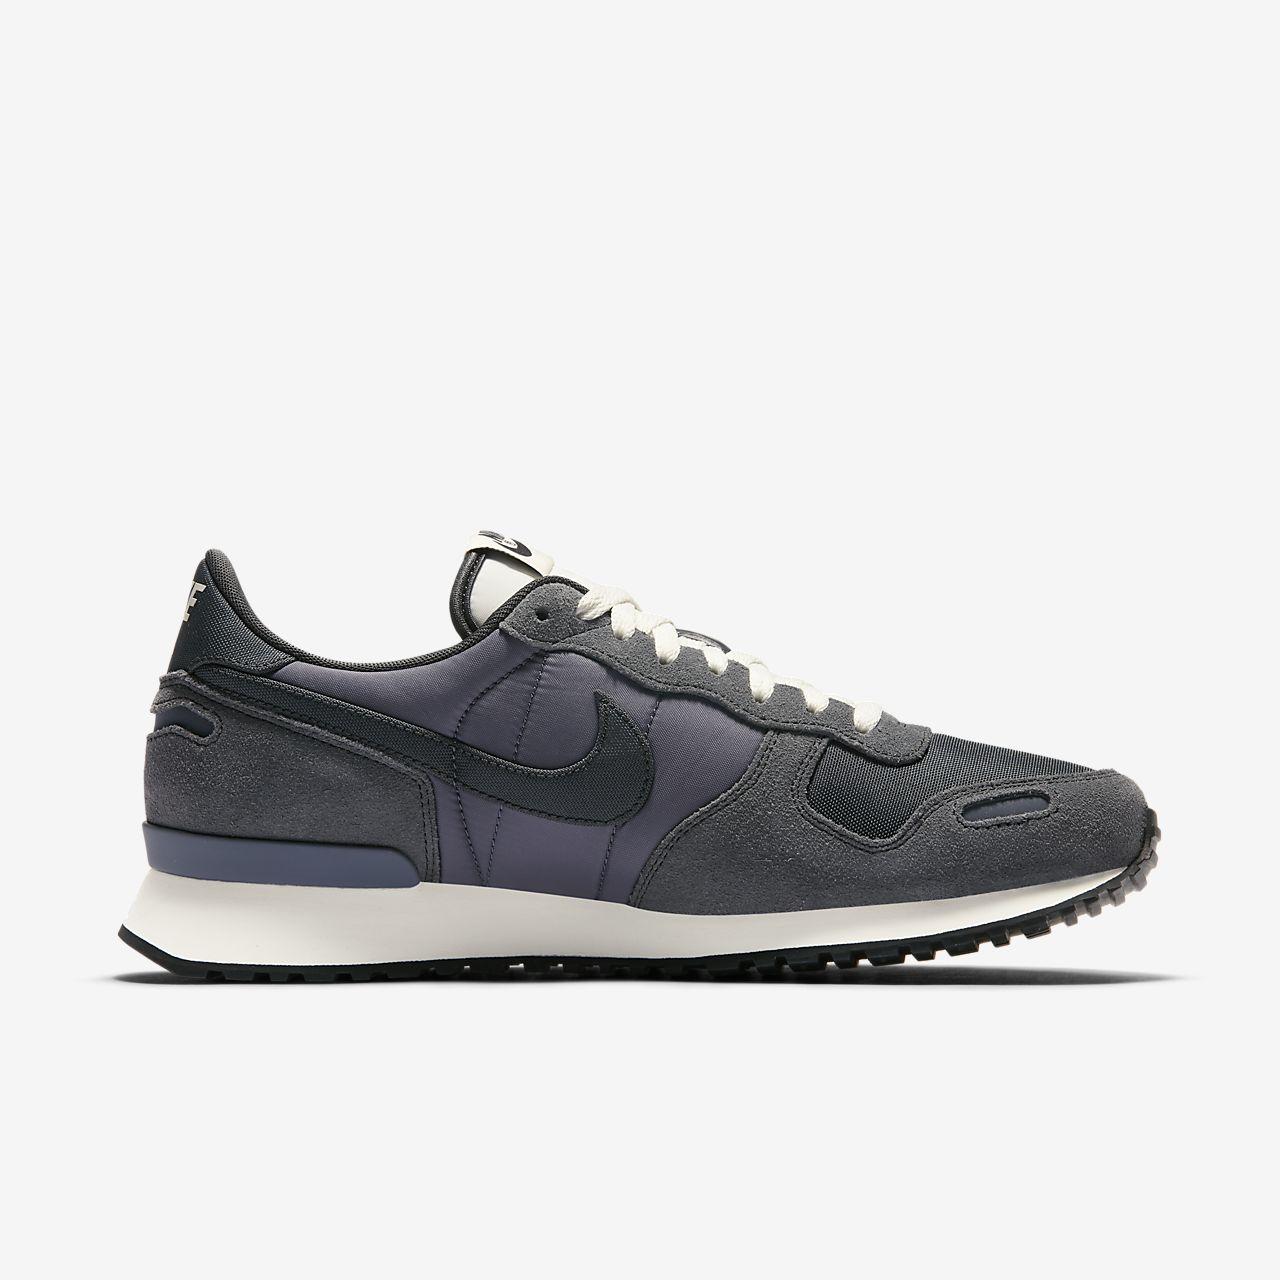 Chaussures Nike Noir Vortex 47 Hommes w8DUTKq5FJ